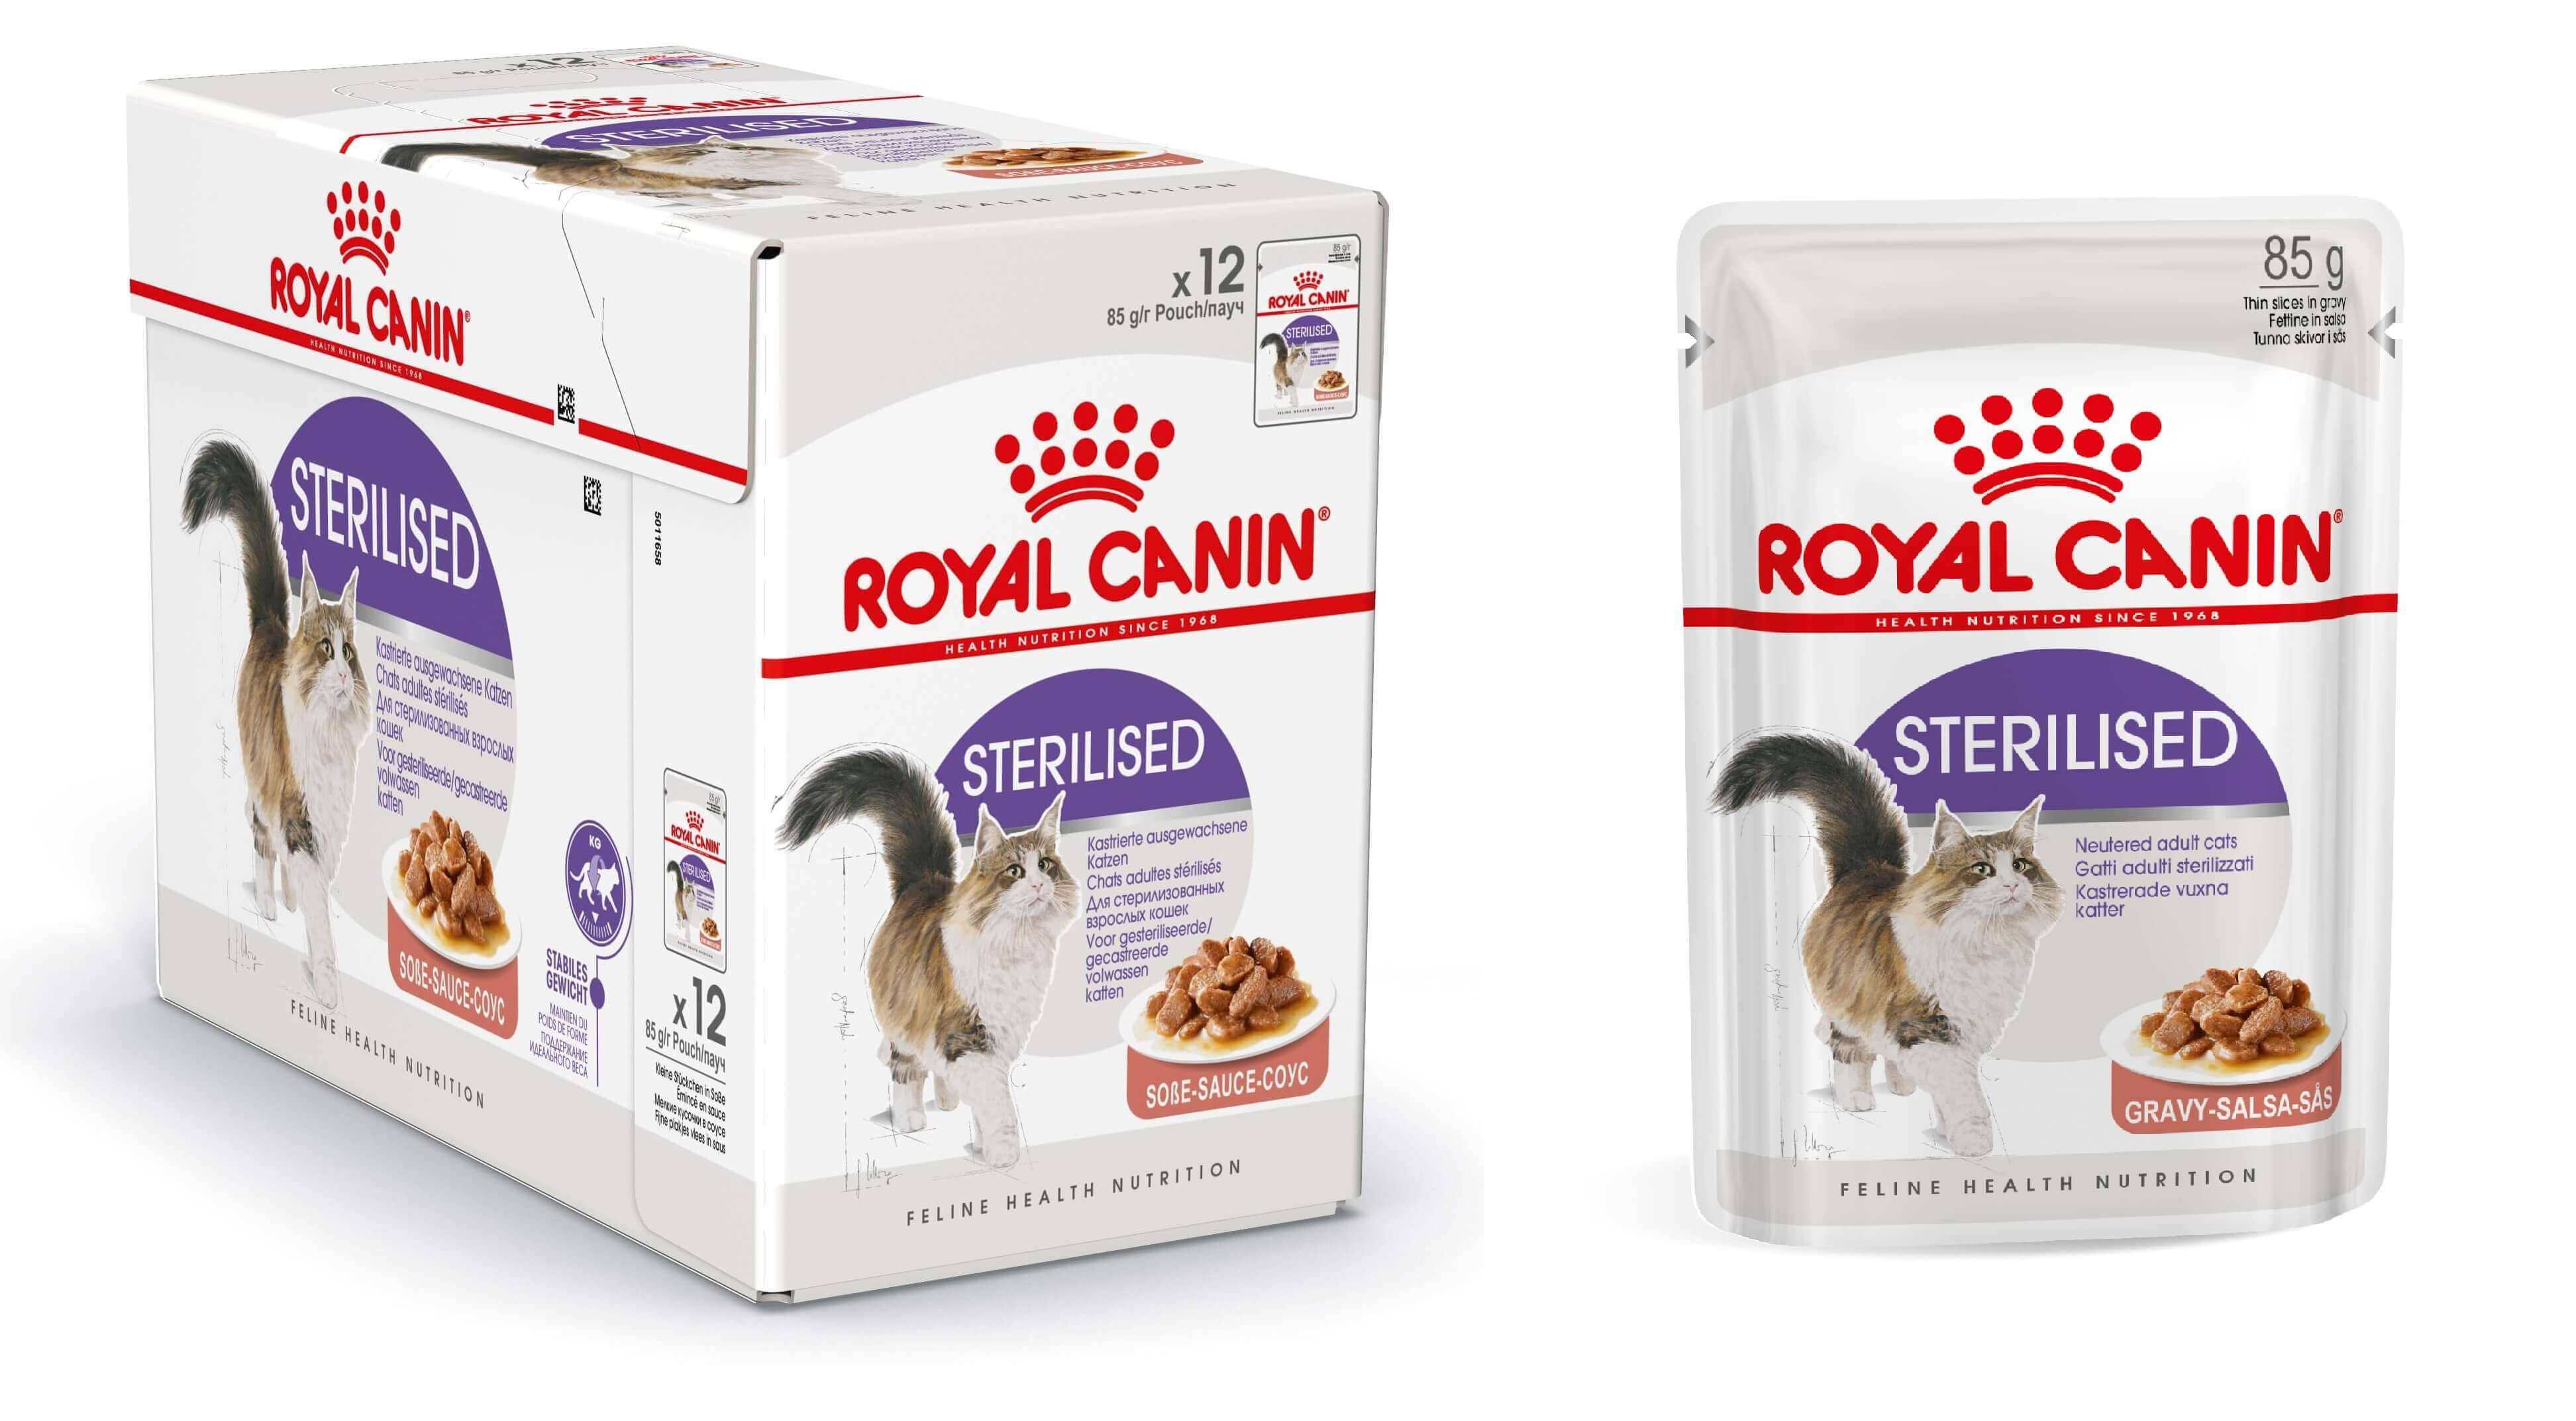 Royal Canin Sterilised pâtée pour chat 12x 1x Sauce + 1x Gelée (24x85 gr)